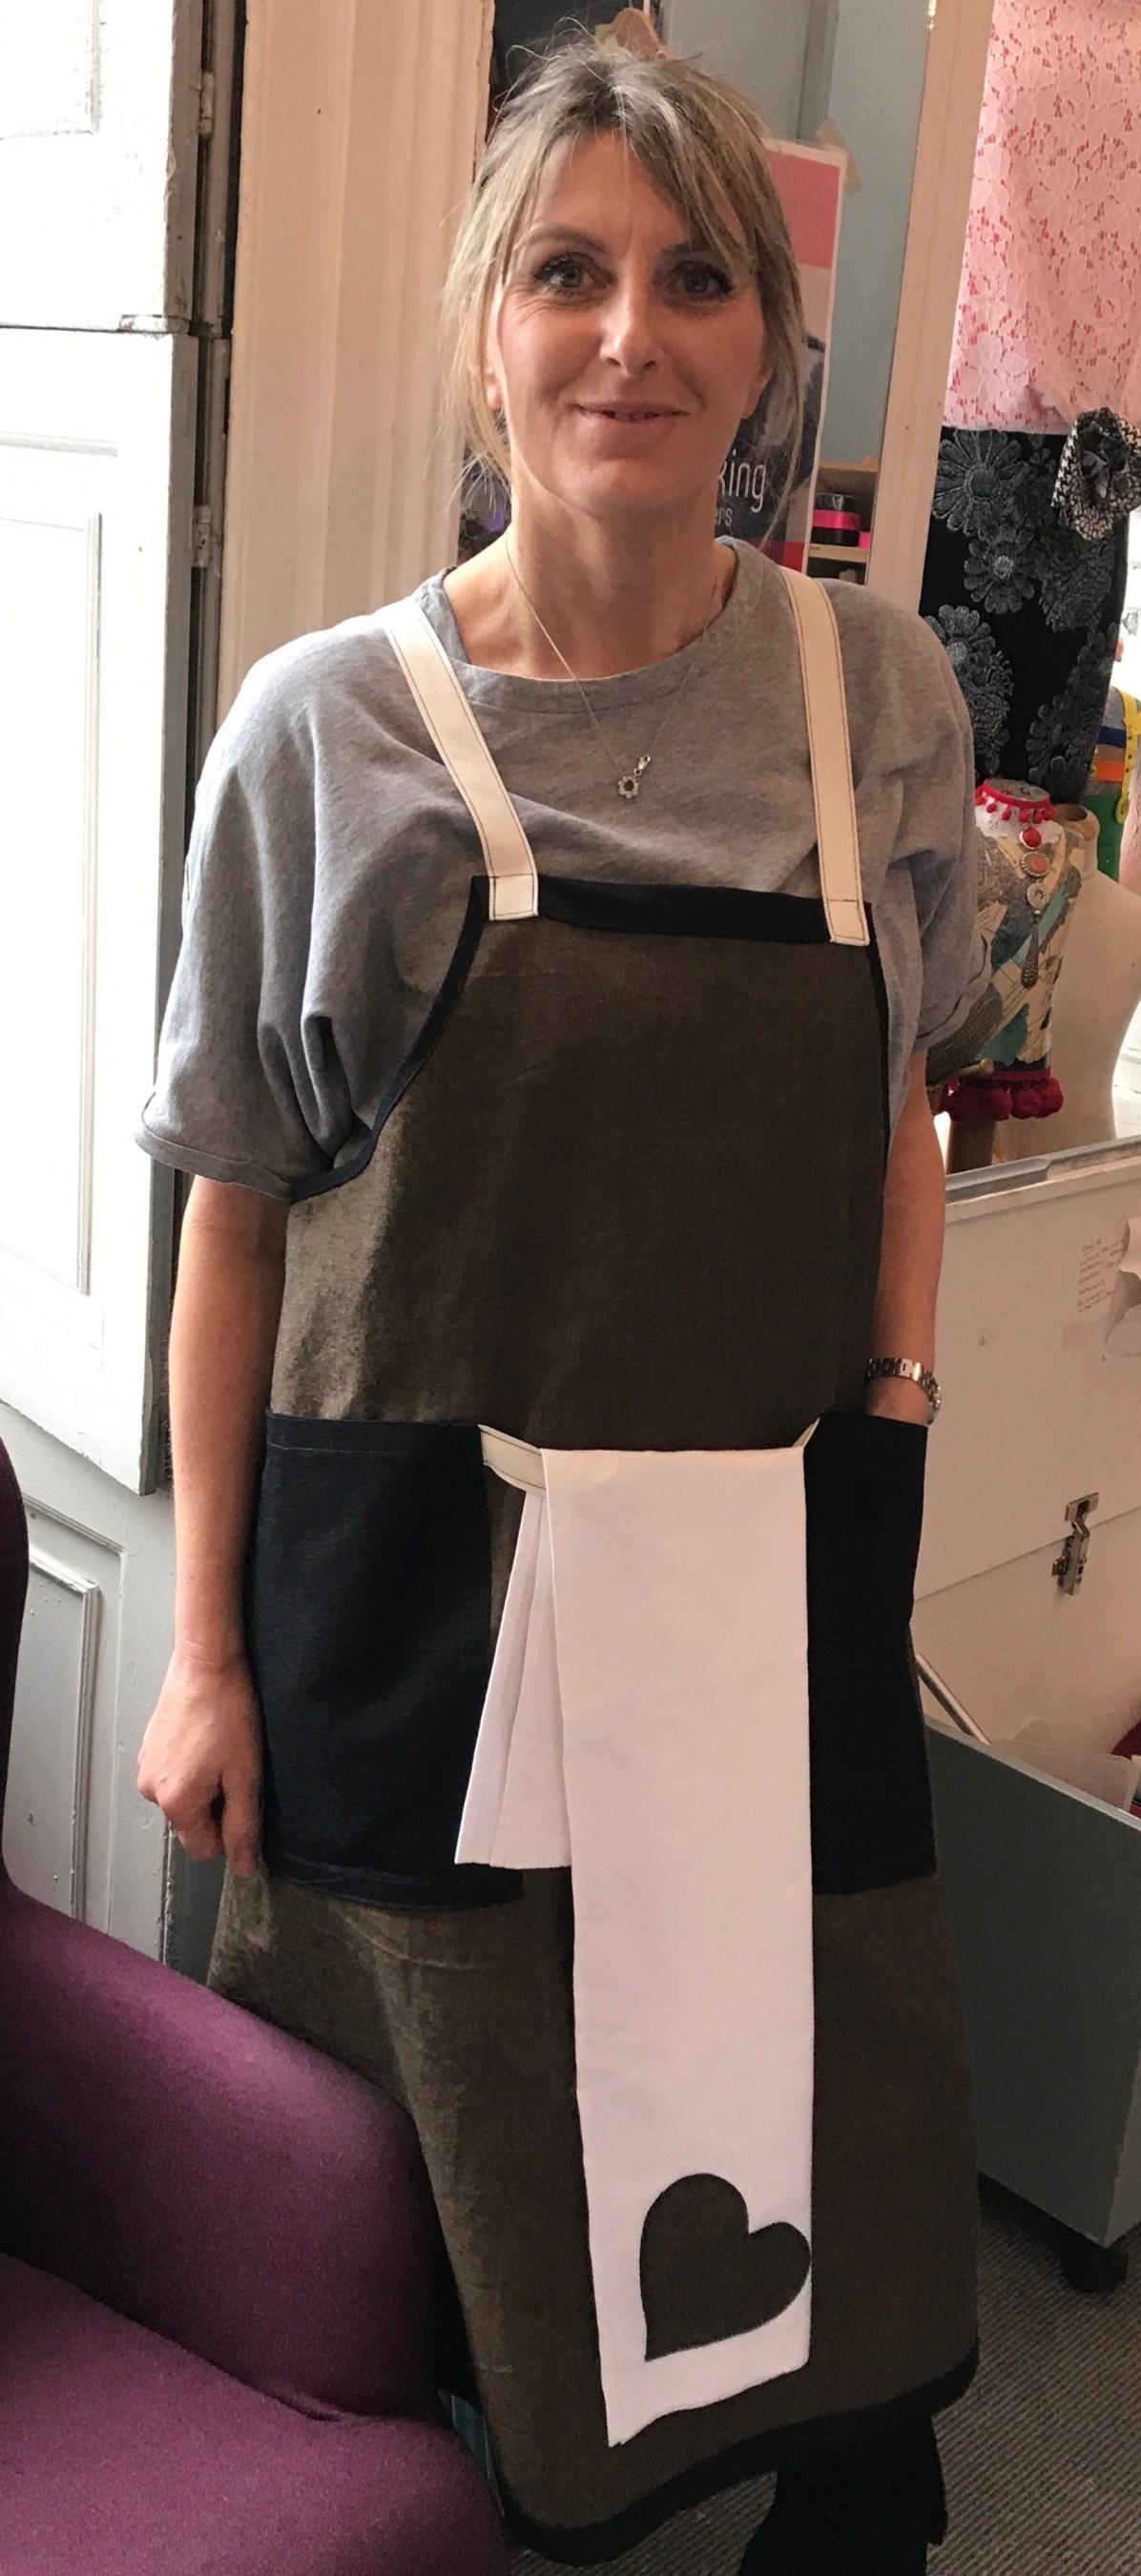 unisex apron